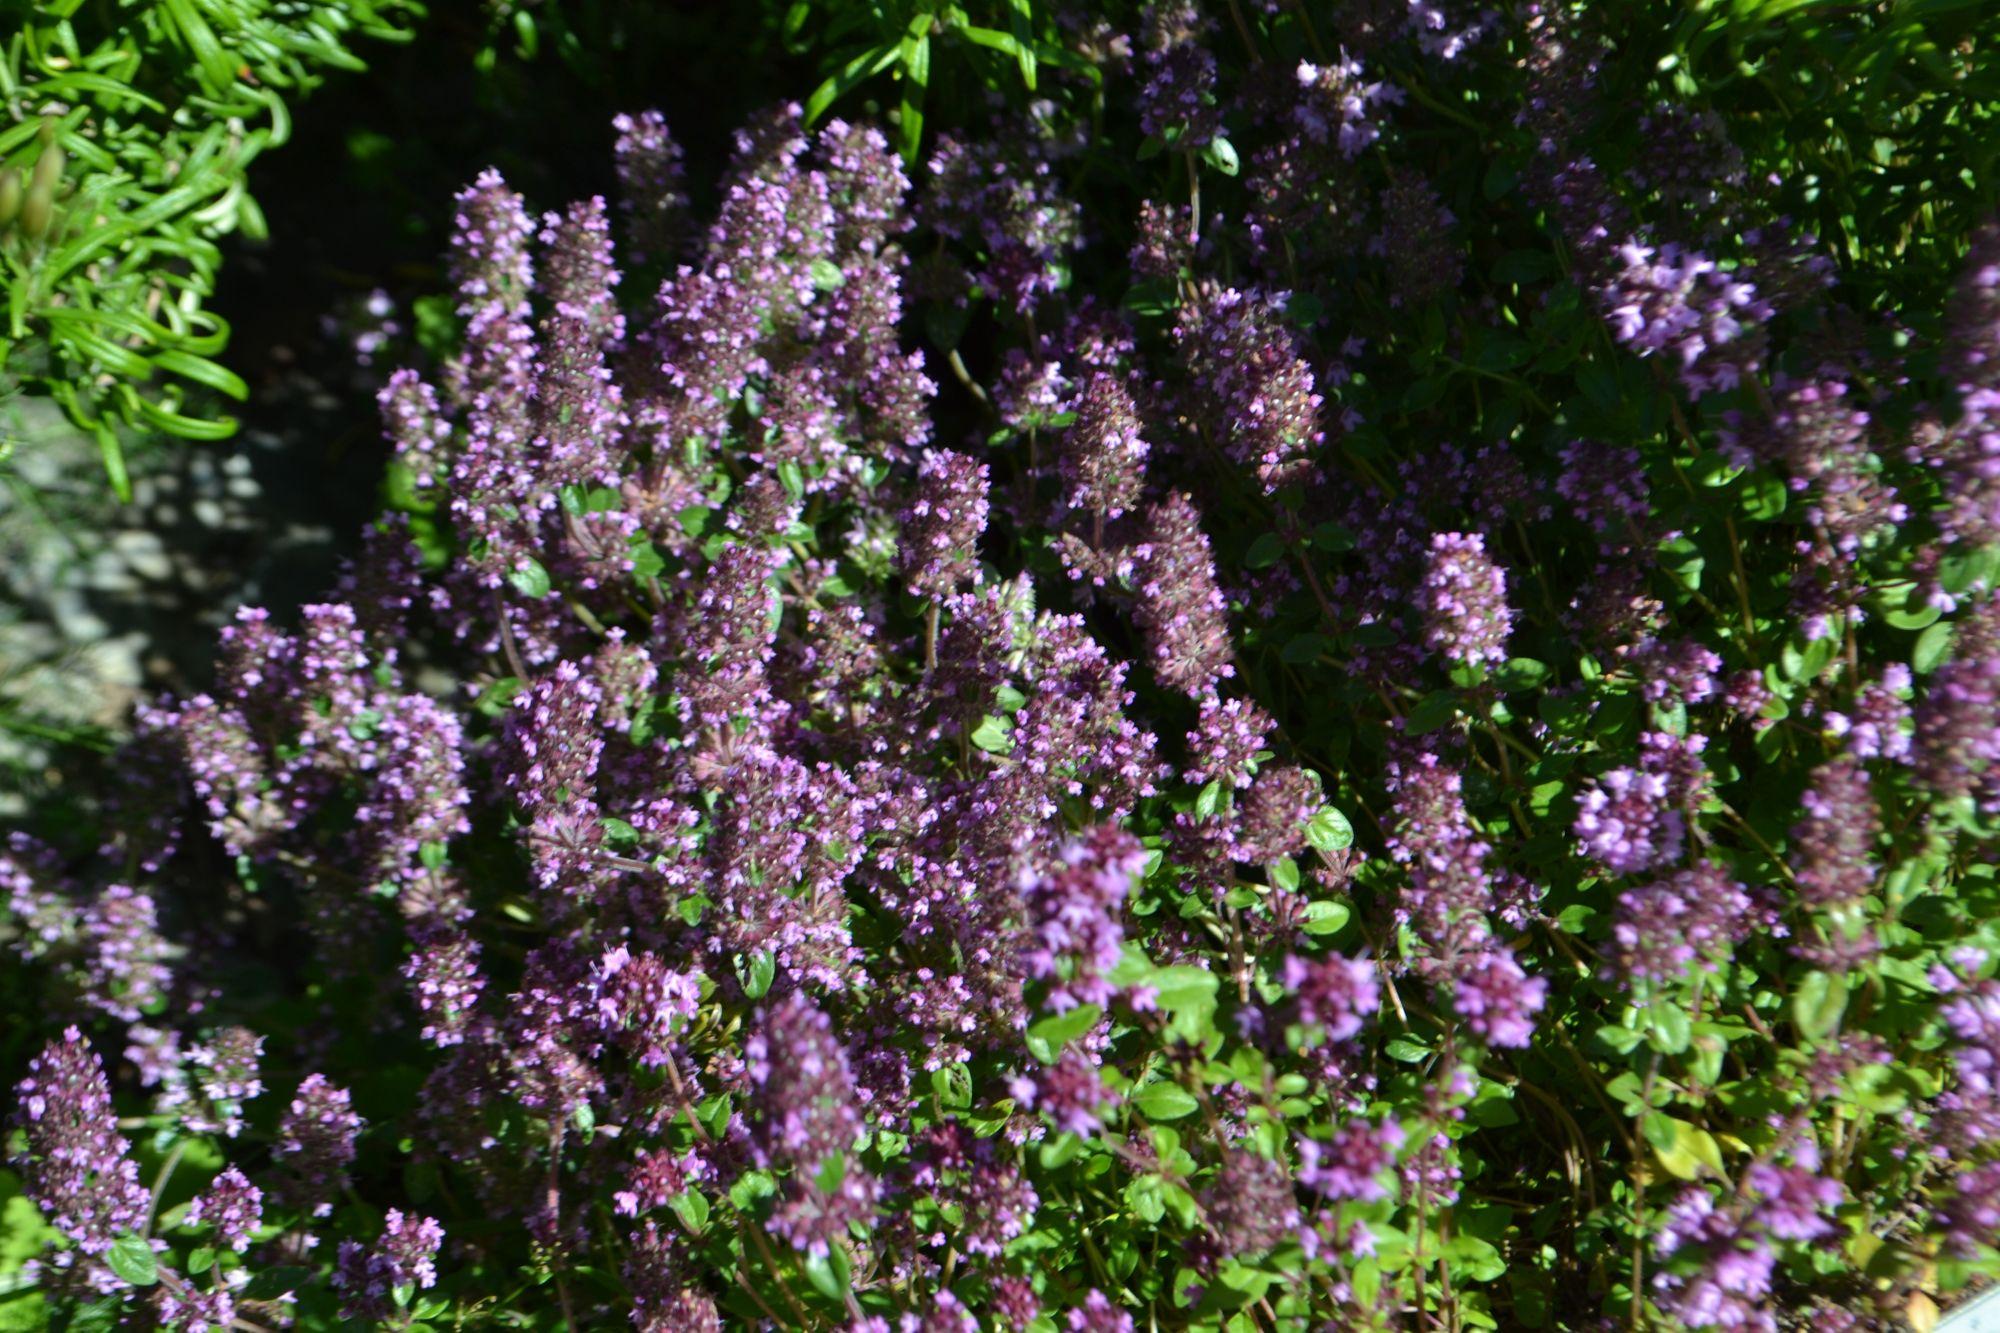 Paprastasis čiobrelis, porūšis serpyllum (Thymus serpyllum, ssp. serpylum)